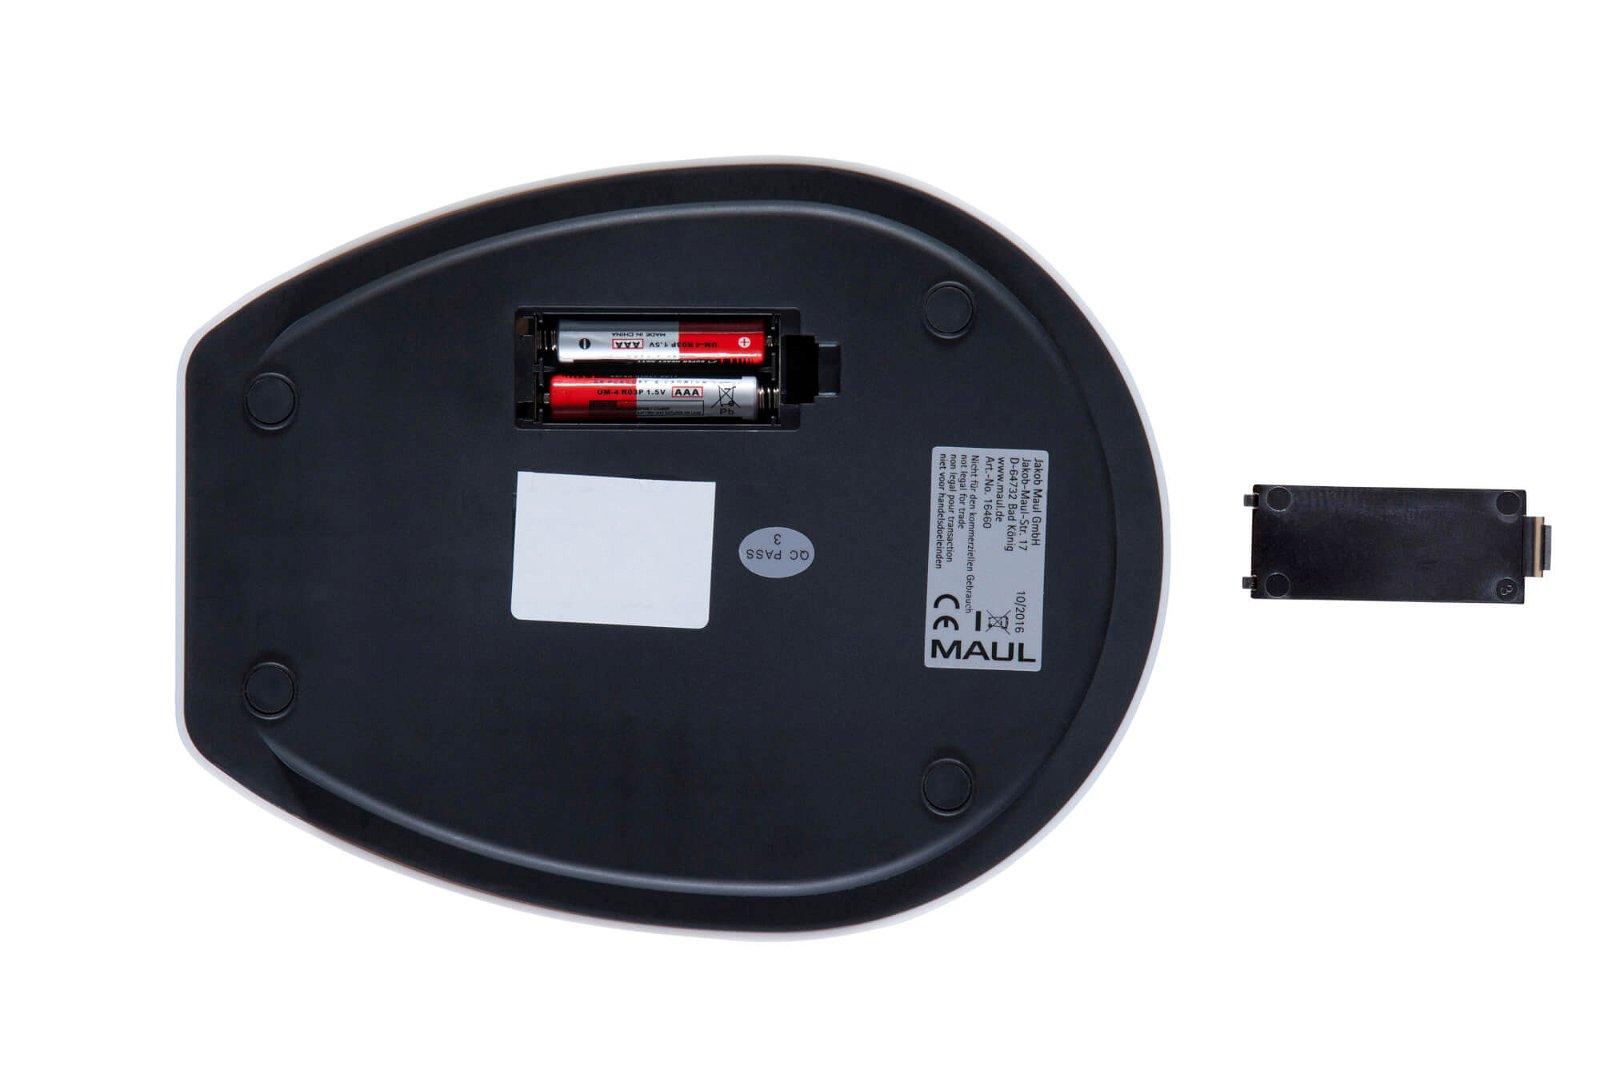 Briefwaage MAULgoal mit Batterie, 5000 g, weiß